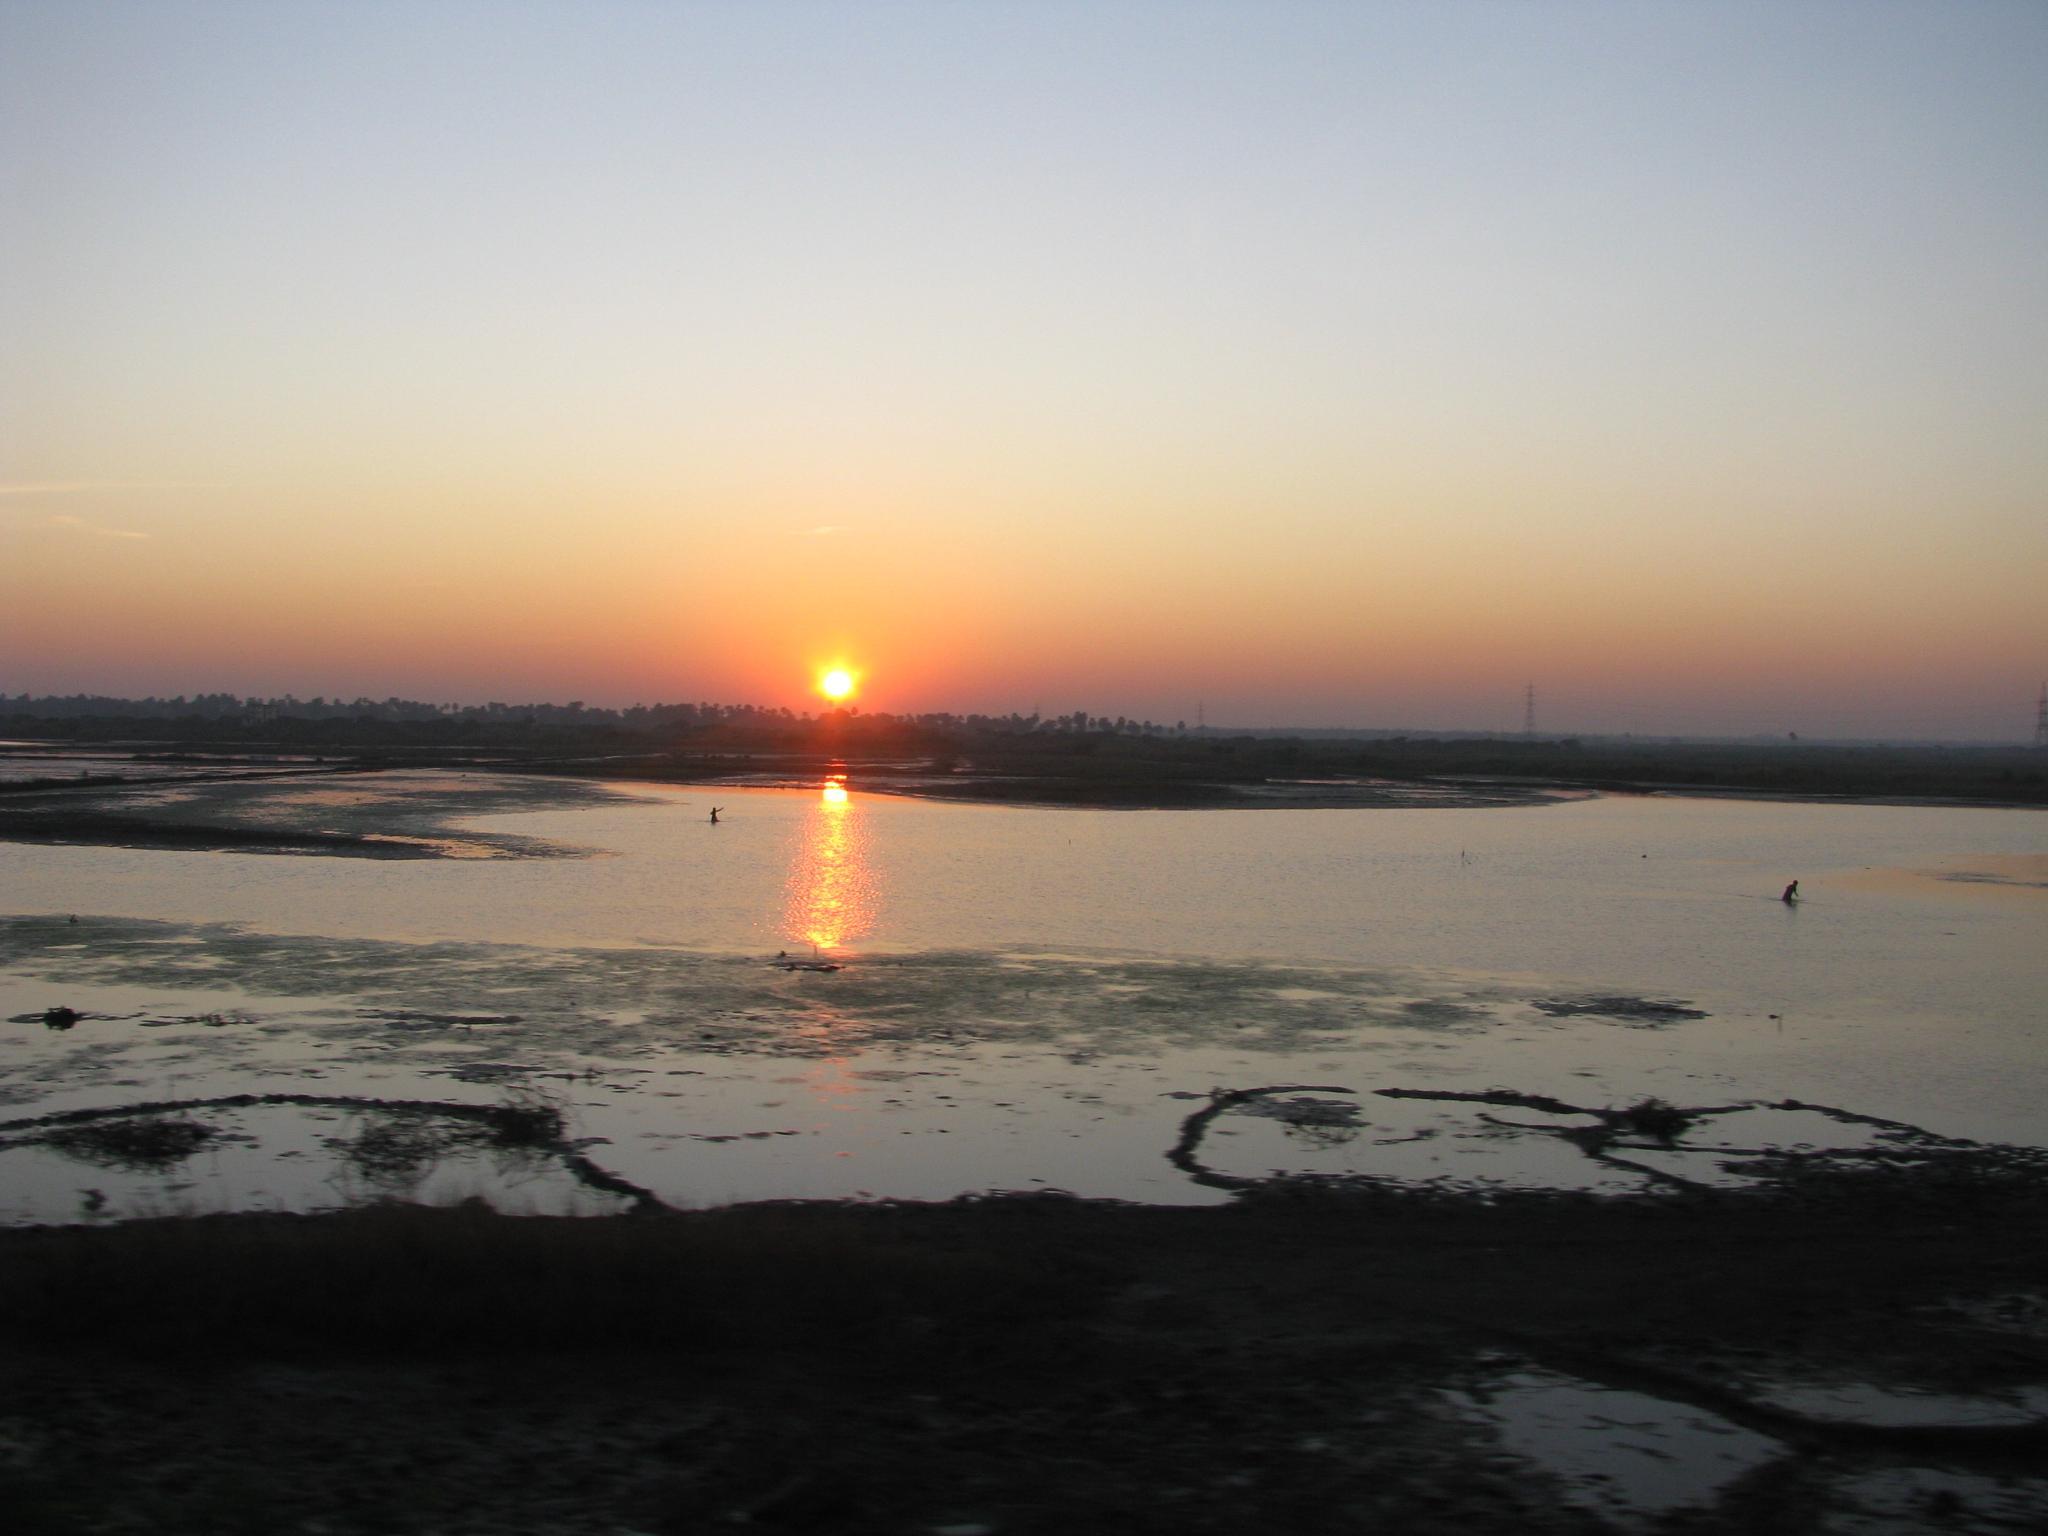 SUNSET by Siddhesh Mandlik